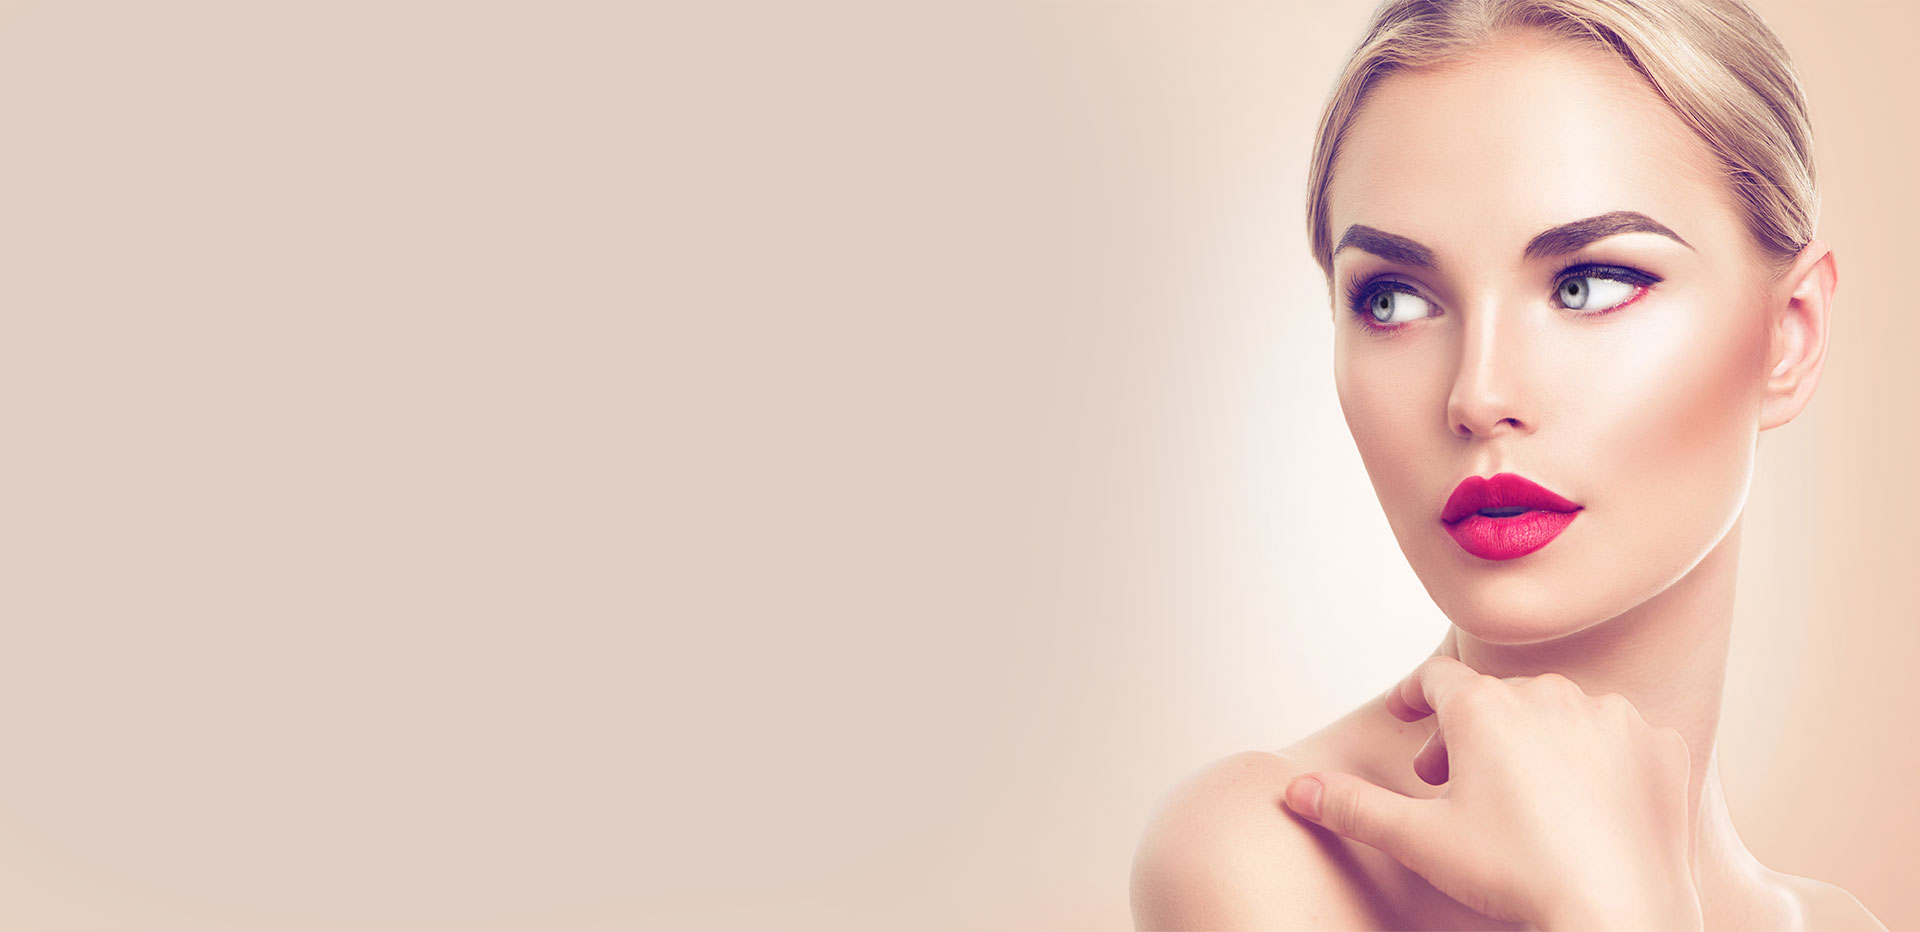 Permanent Makeup Services in Atlanta, GA | Sara Justice